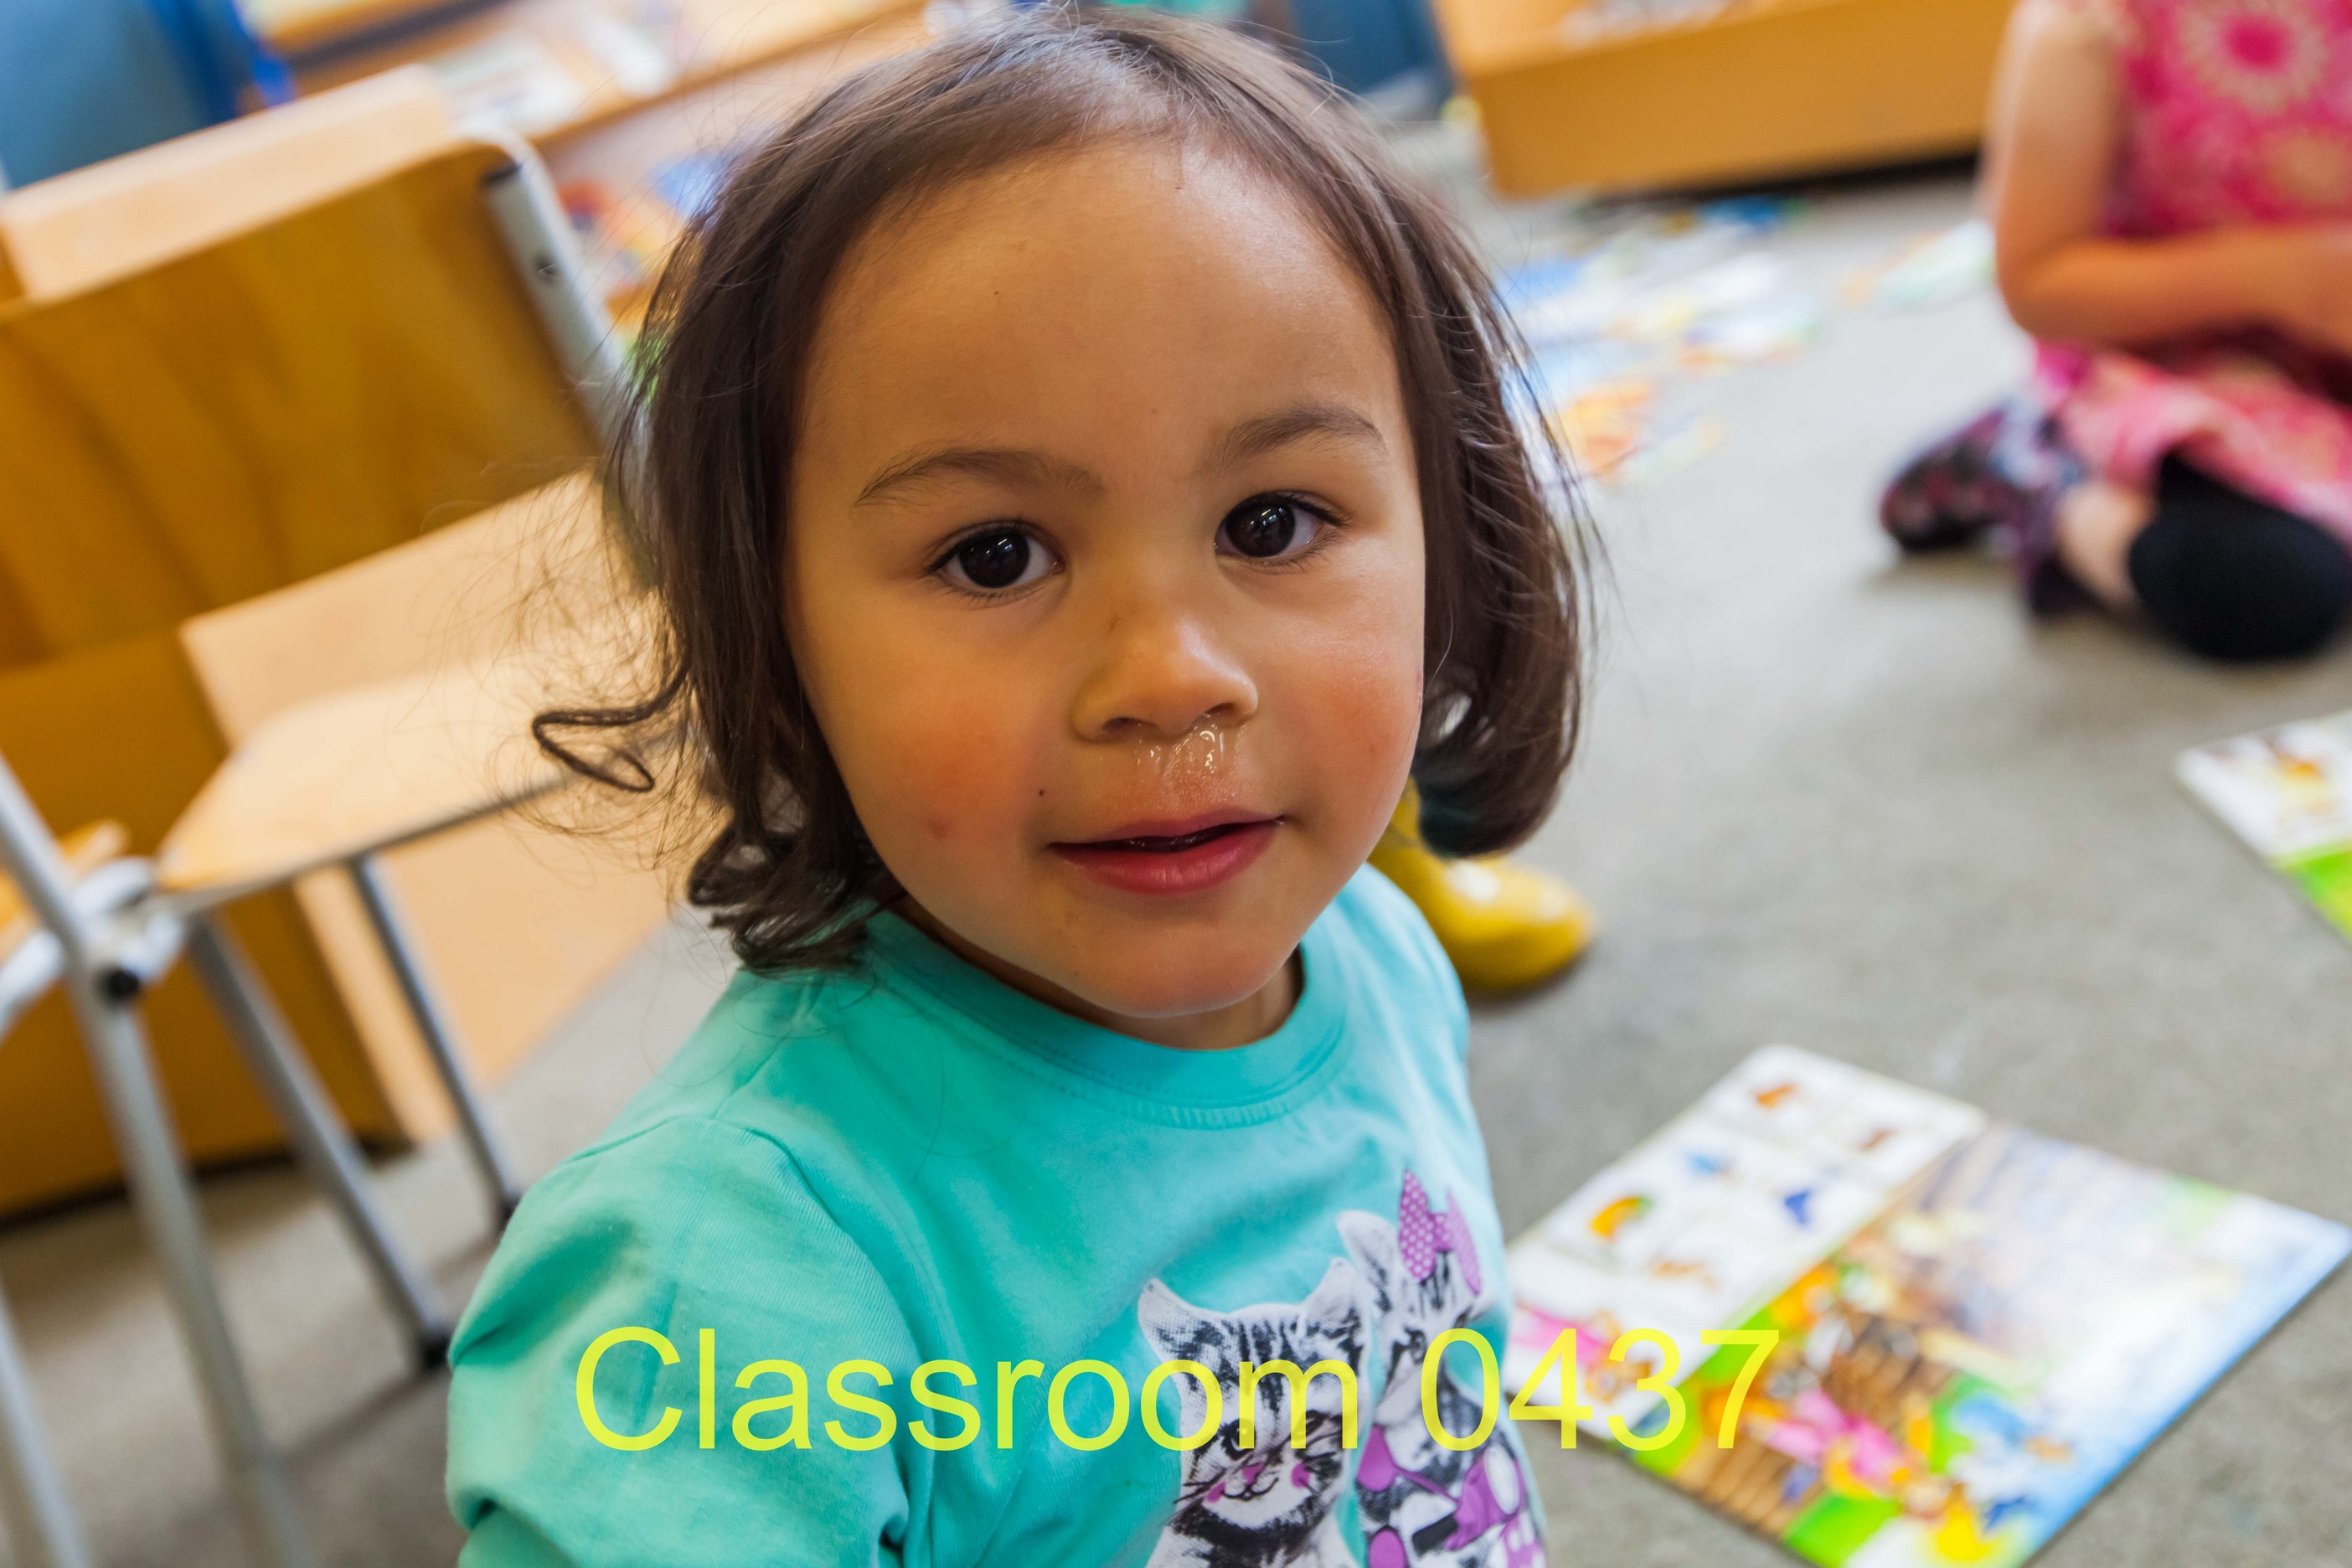 Classroom 0437